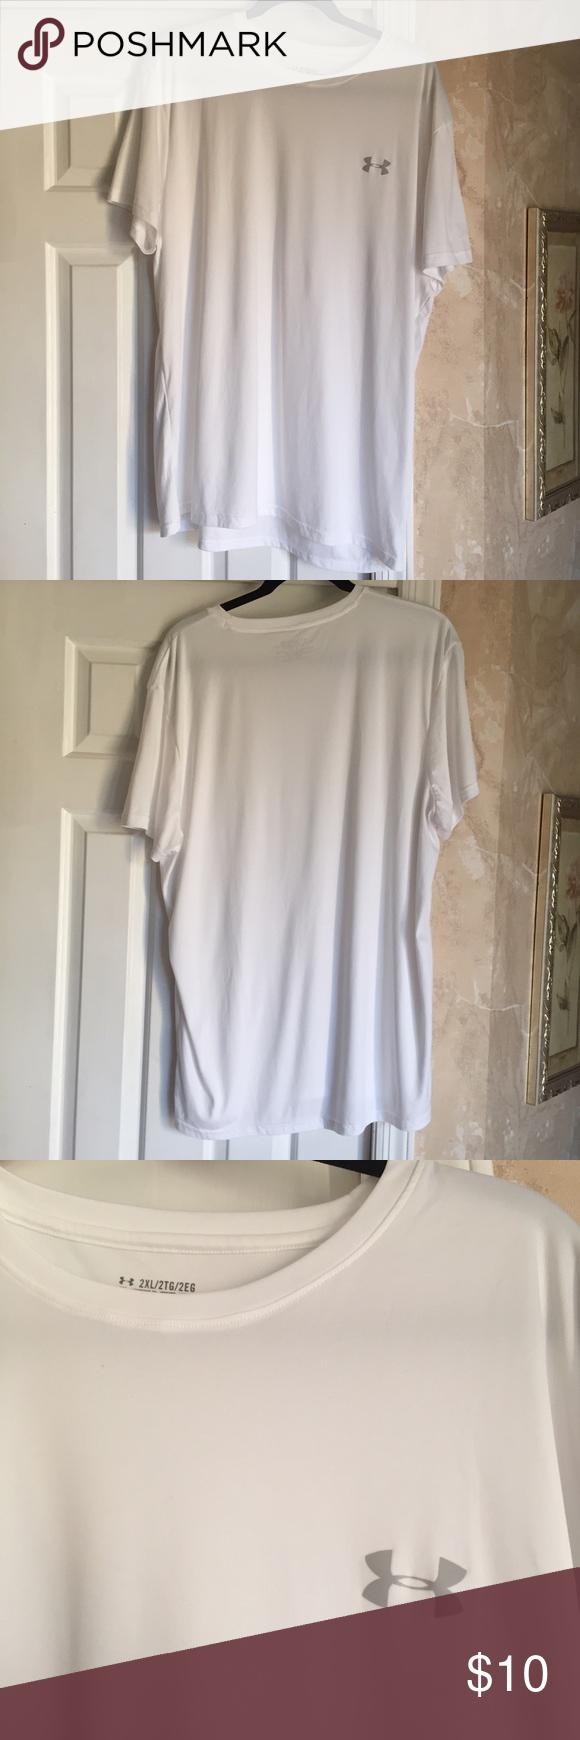 Under Armor short sleeve t shirt Under Armor short sleeve t shirt. Size XXL. 100% polyester. Under Armour Shirts Tees - Short Sleeve